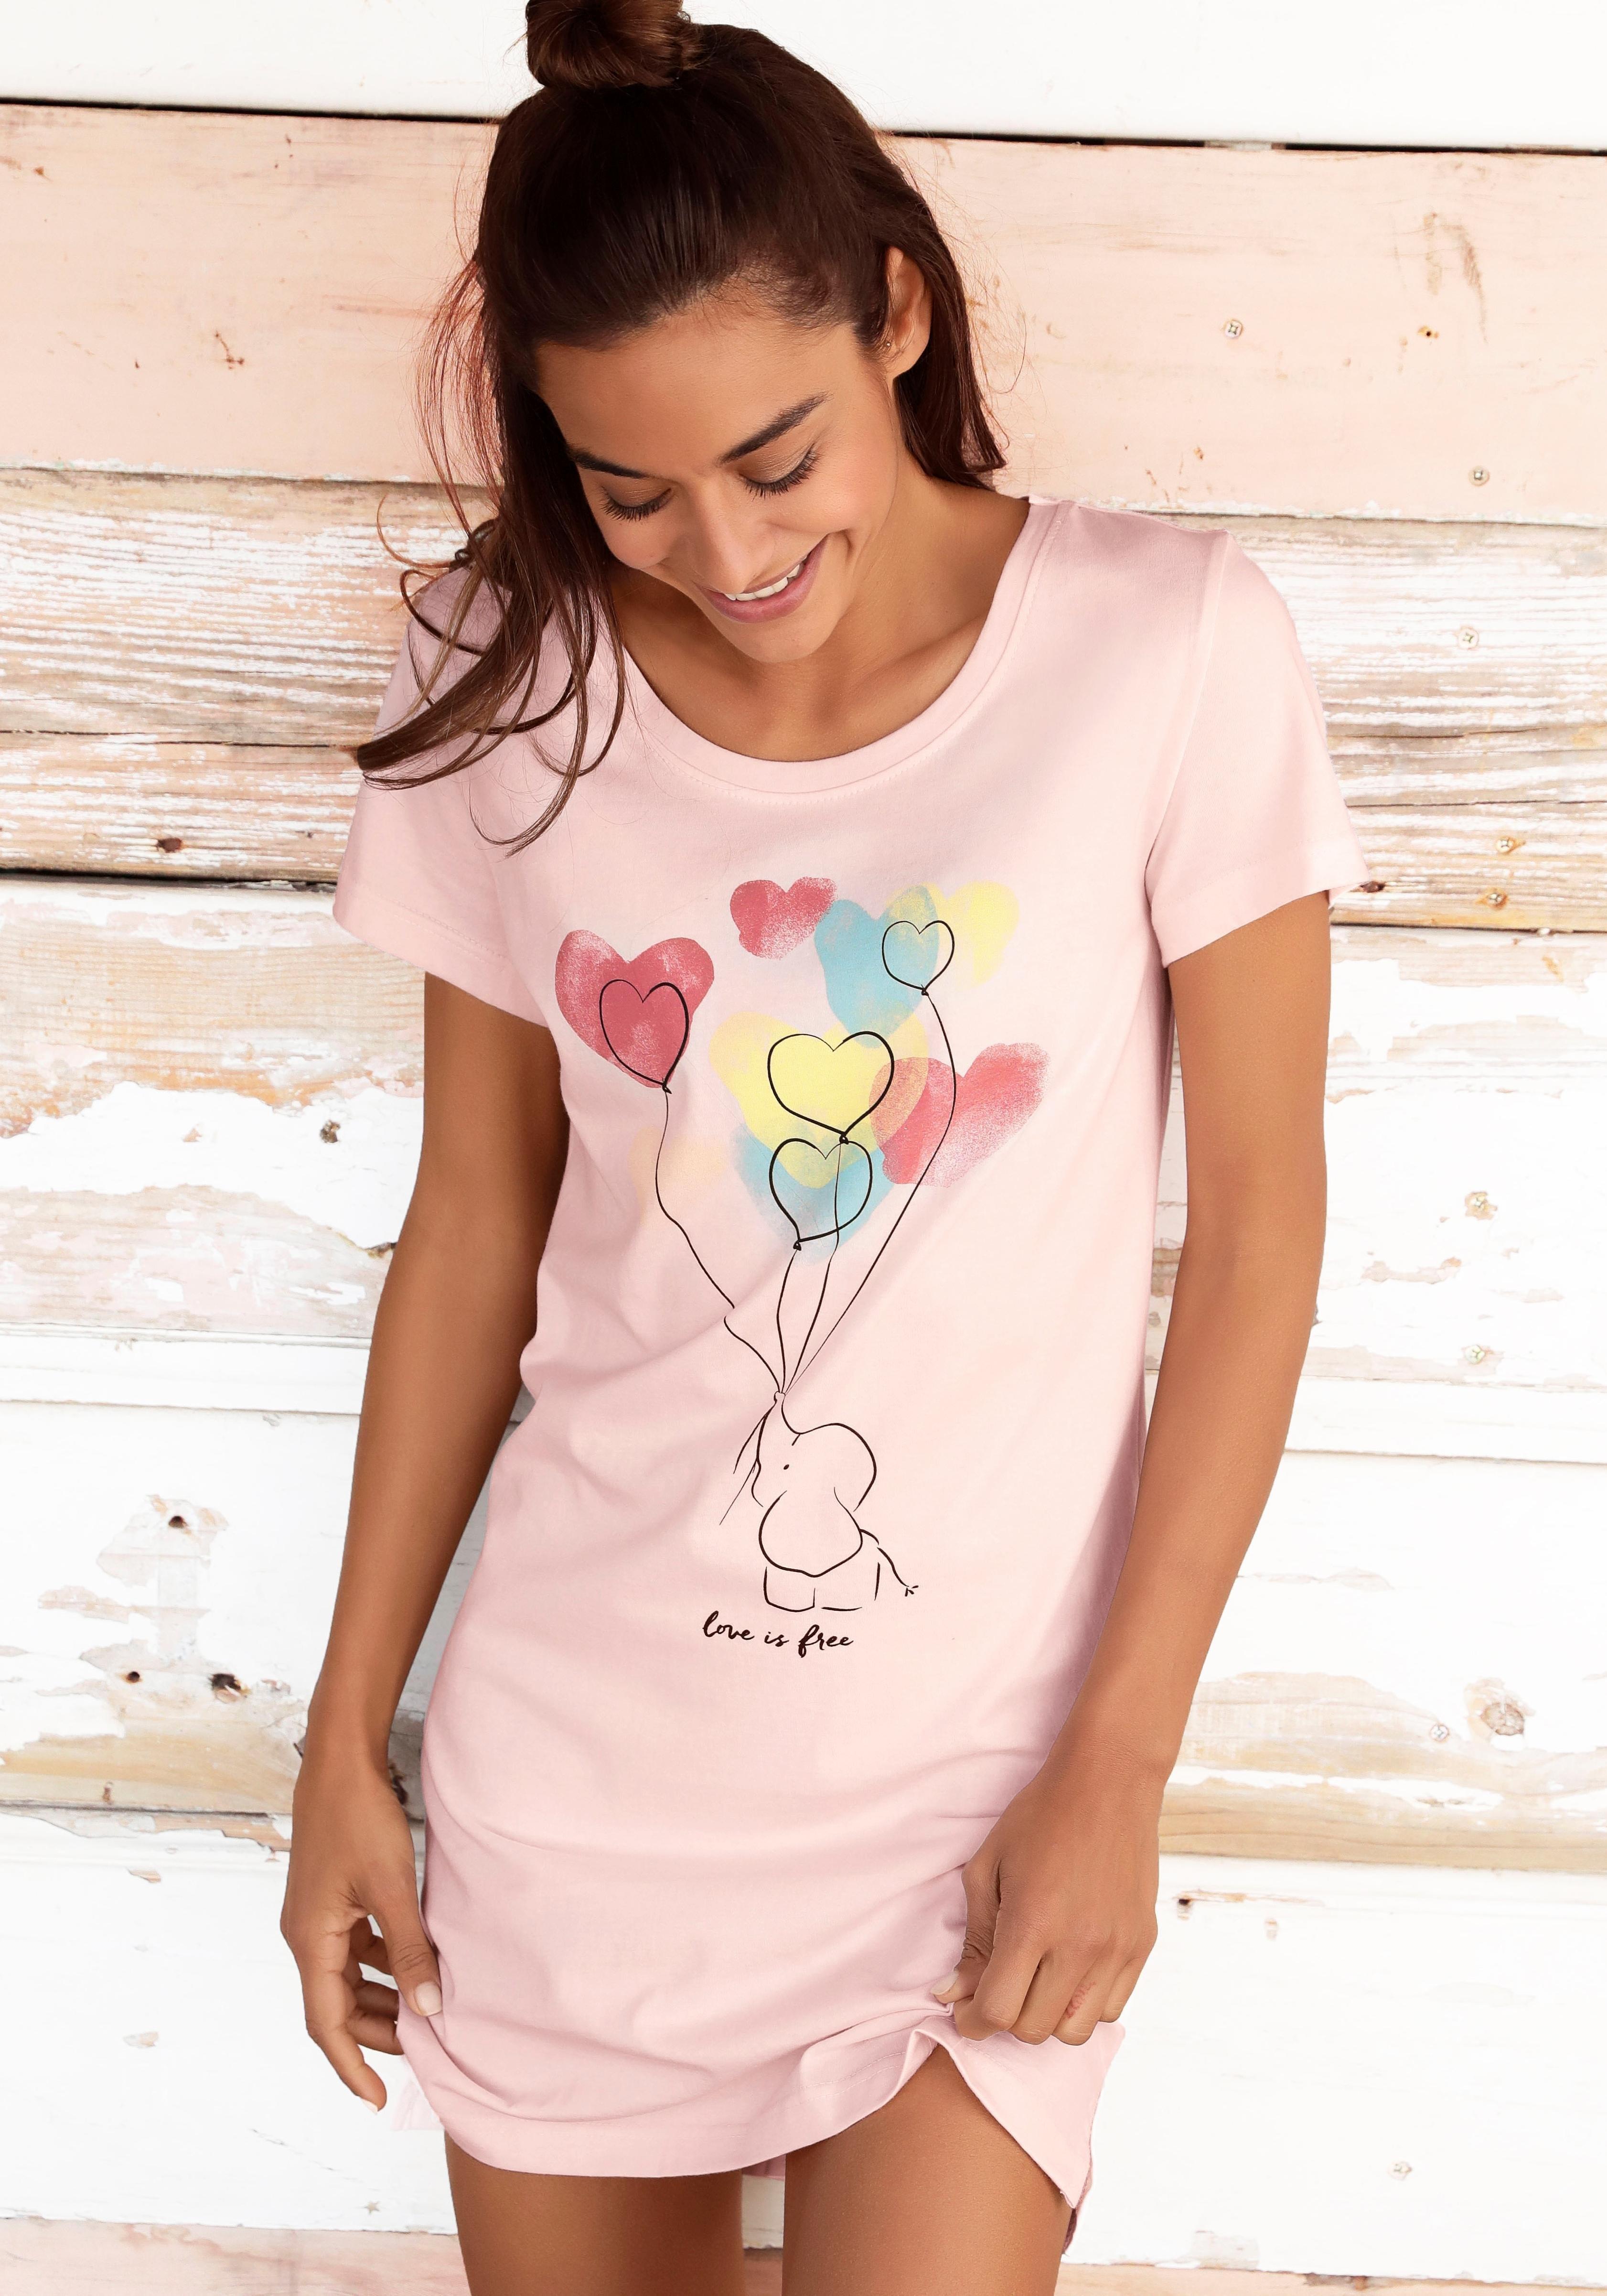 Vivance Collection Vivance Dreams nachthemd in de webshop van Lascana kopen